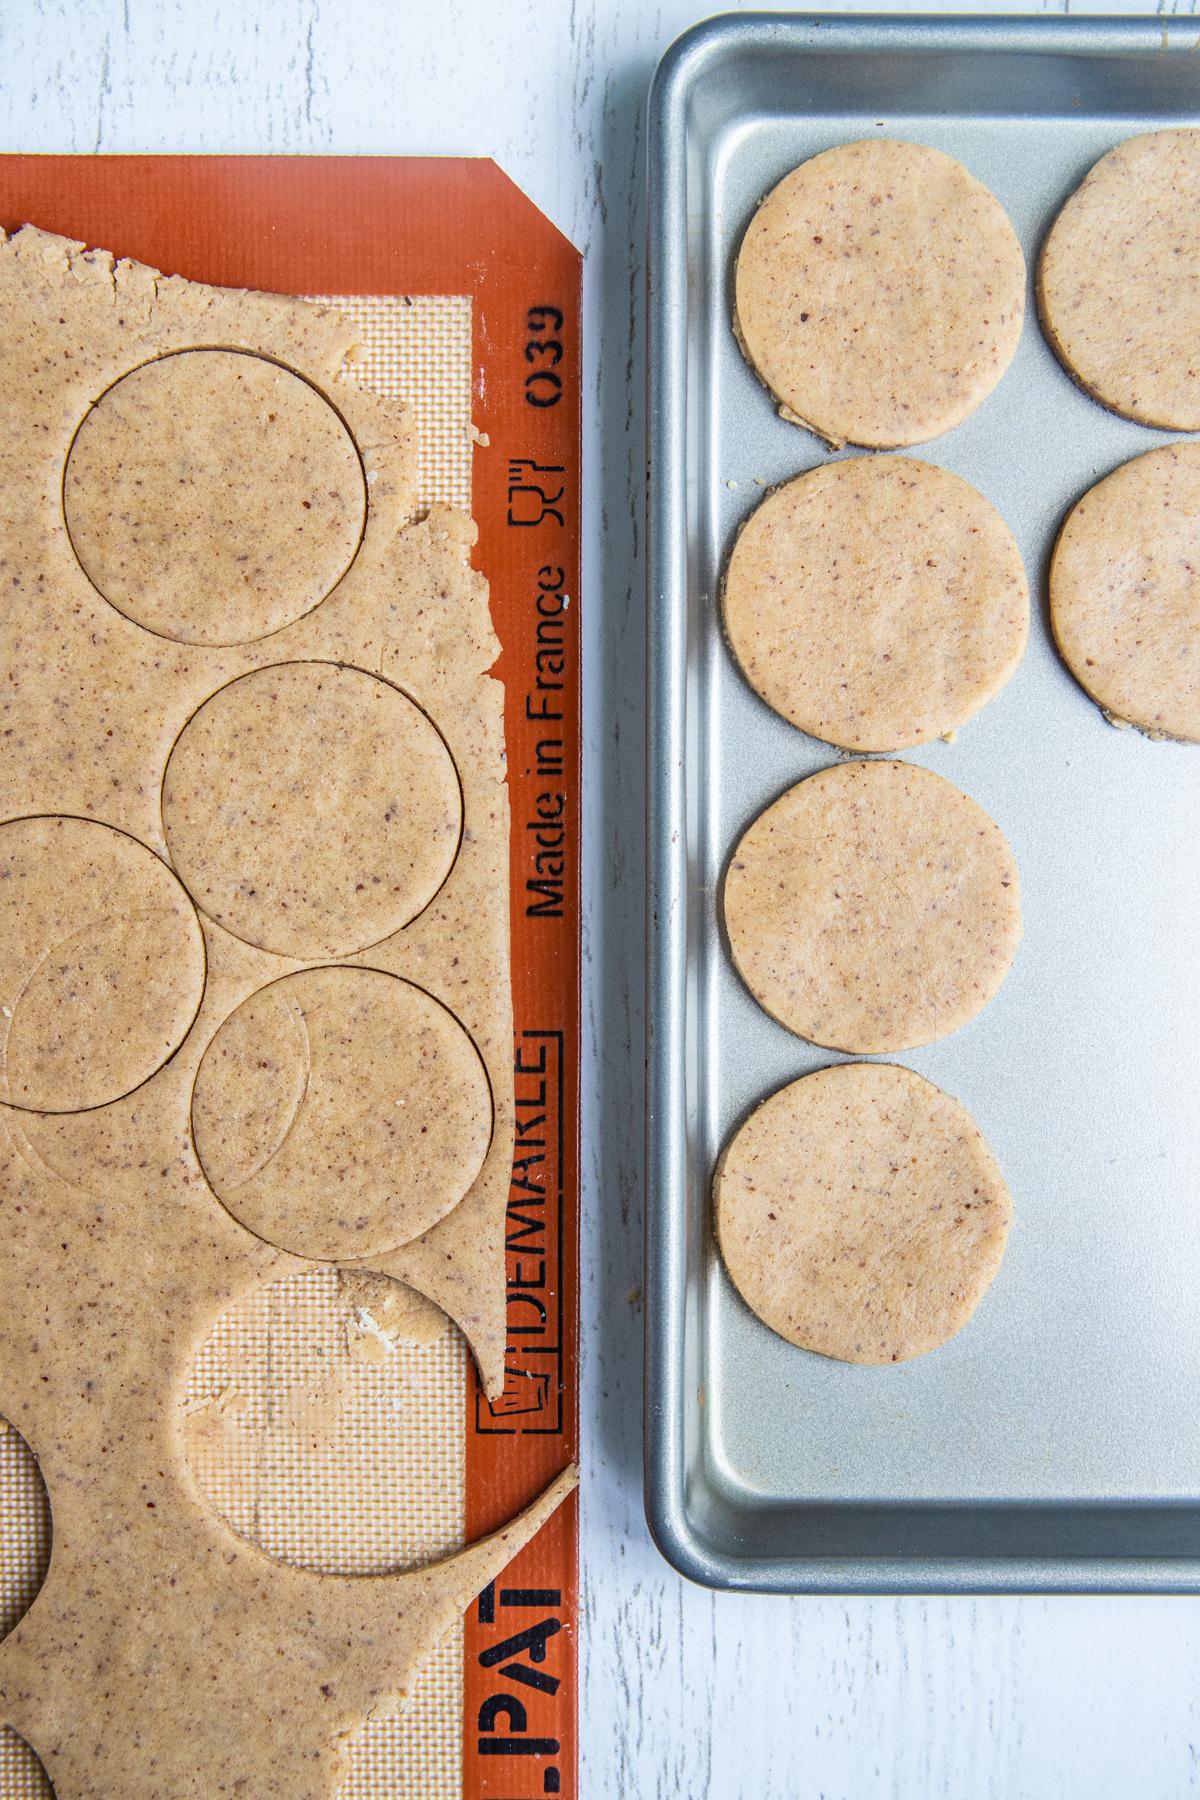 Hazelnut Chocolate Cookie Dough Cut Into 2.5-inch Circles